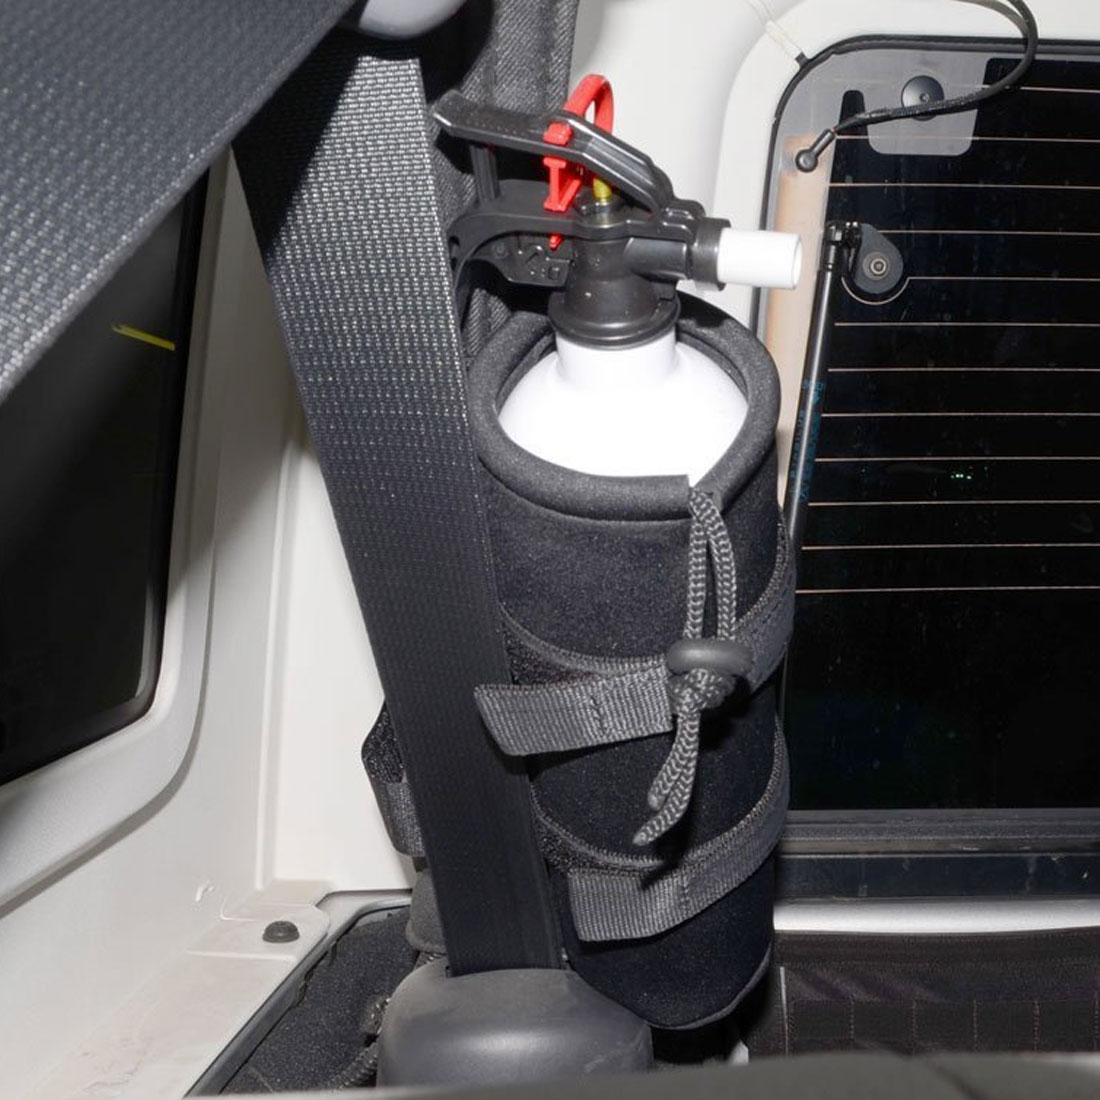 Dewtreetali Fire Extinguisher Holder Nylon Straps Black Roll Bar Holder Car Styling For Jeep Wrangler TJ YJ JK CJ